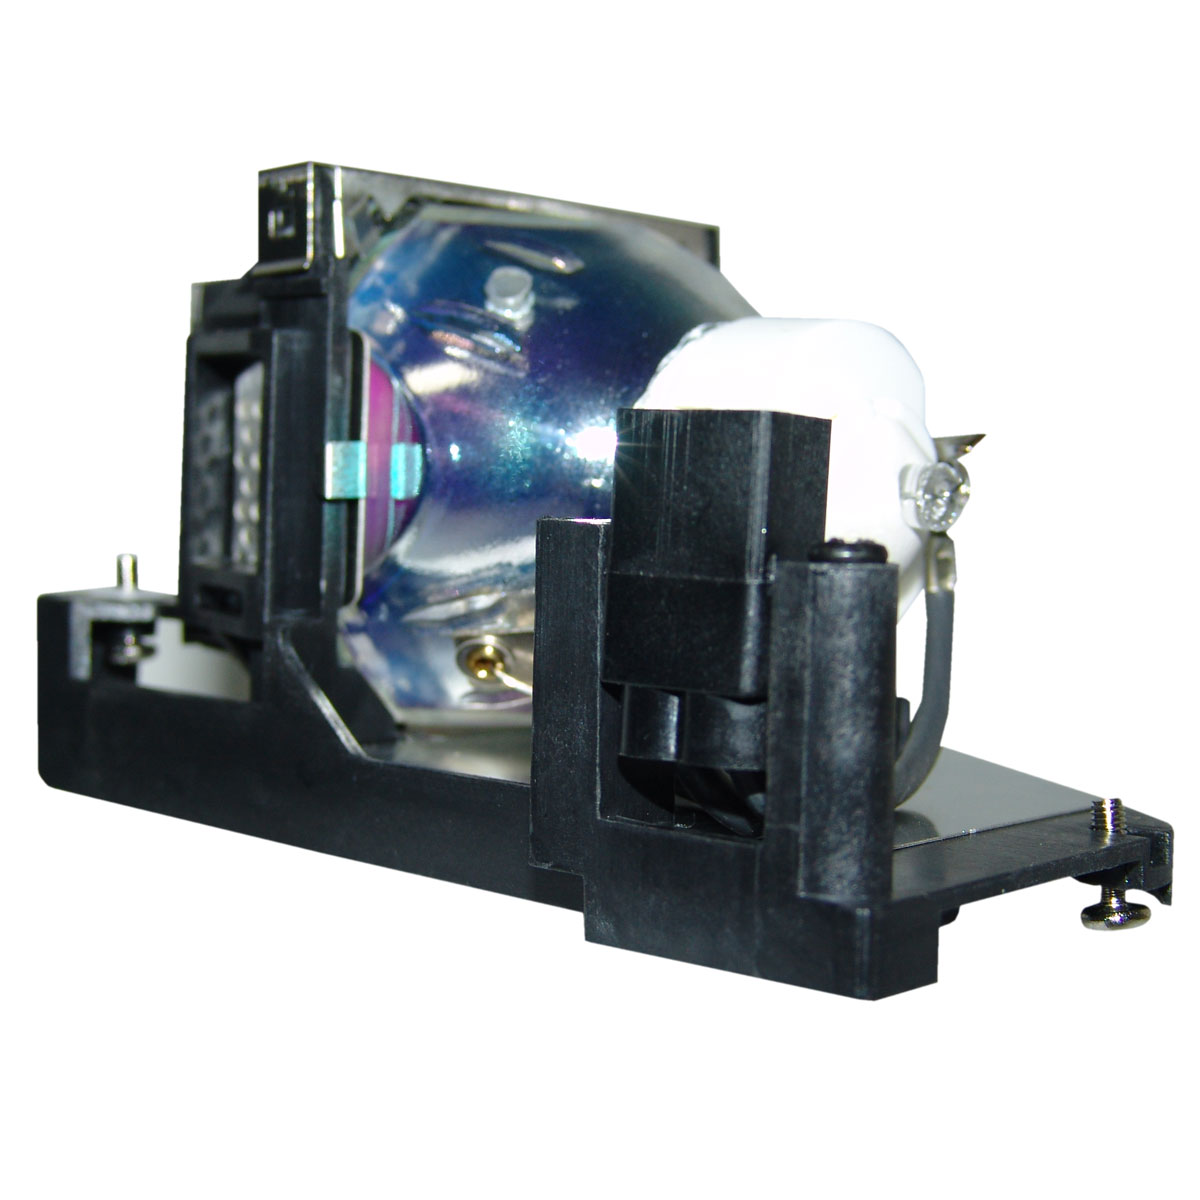 Panasonic Replacement Lamp for PTTW231RU and PTTW230U ETLAT100